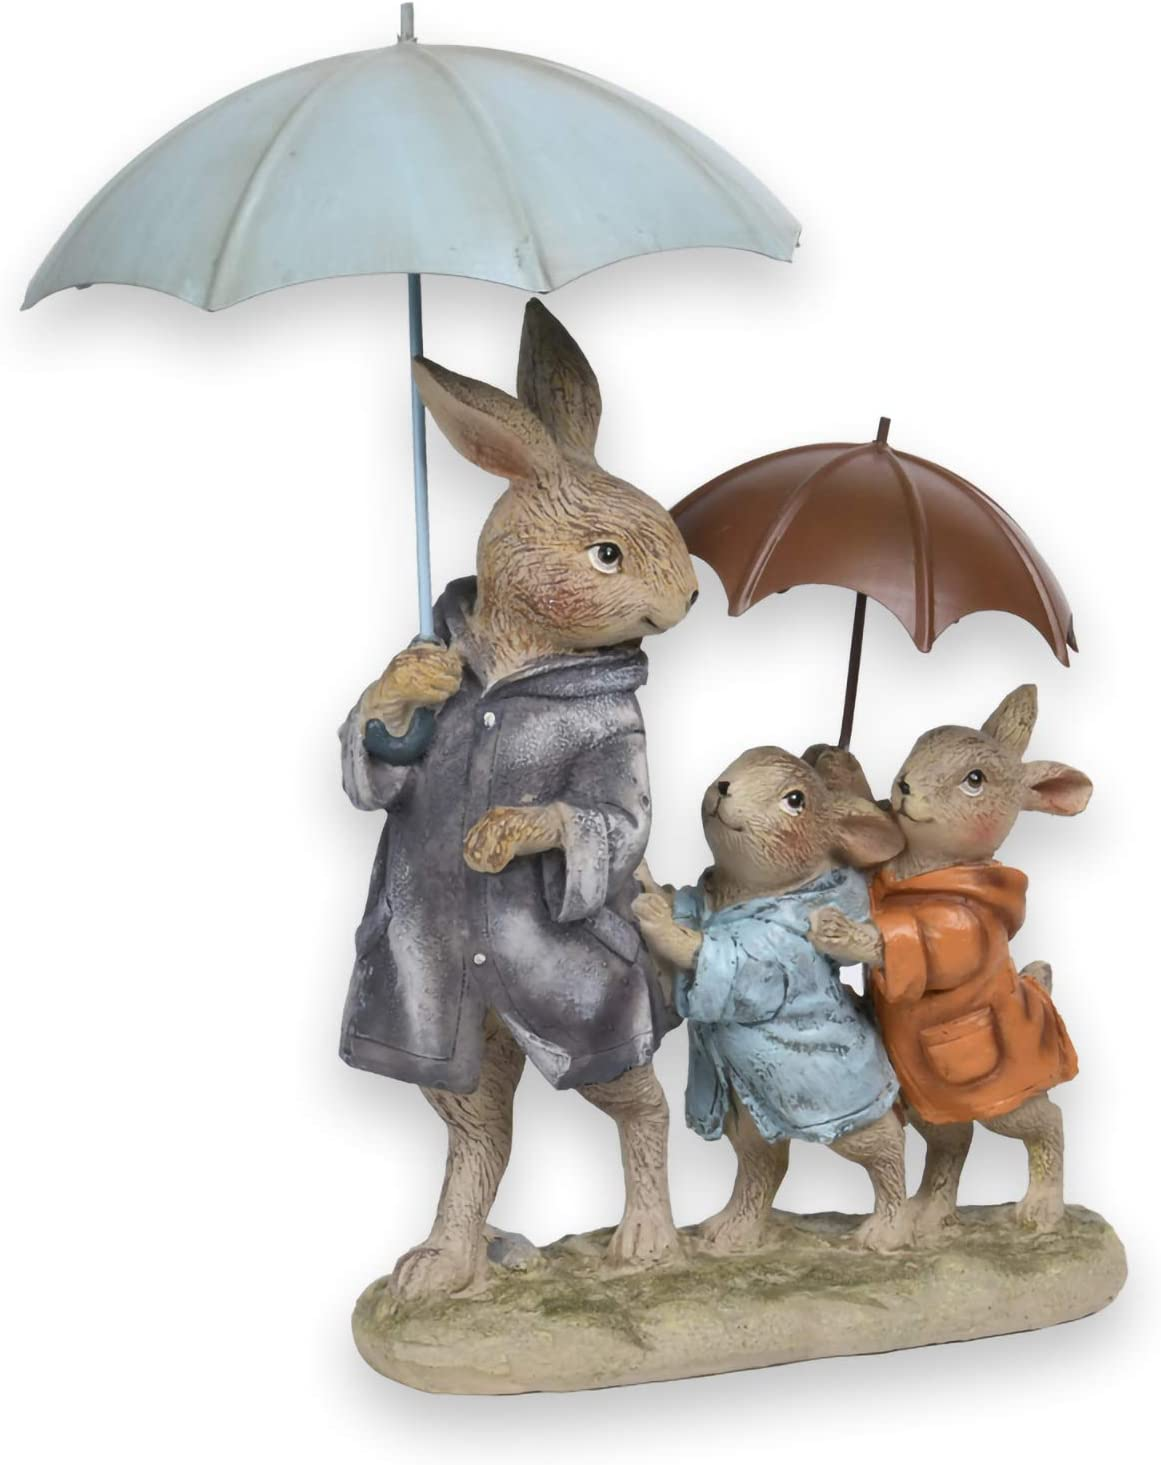 Newman House Studio Rabbit Family Decoration Metal-Umbrella Bunny Figurine Home décor